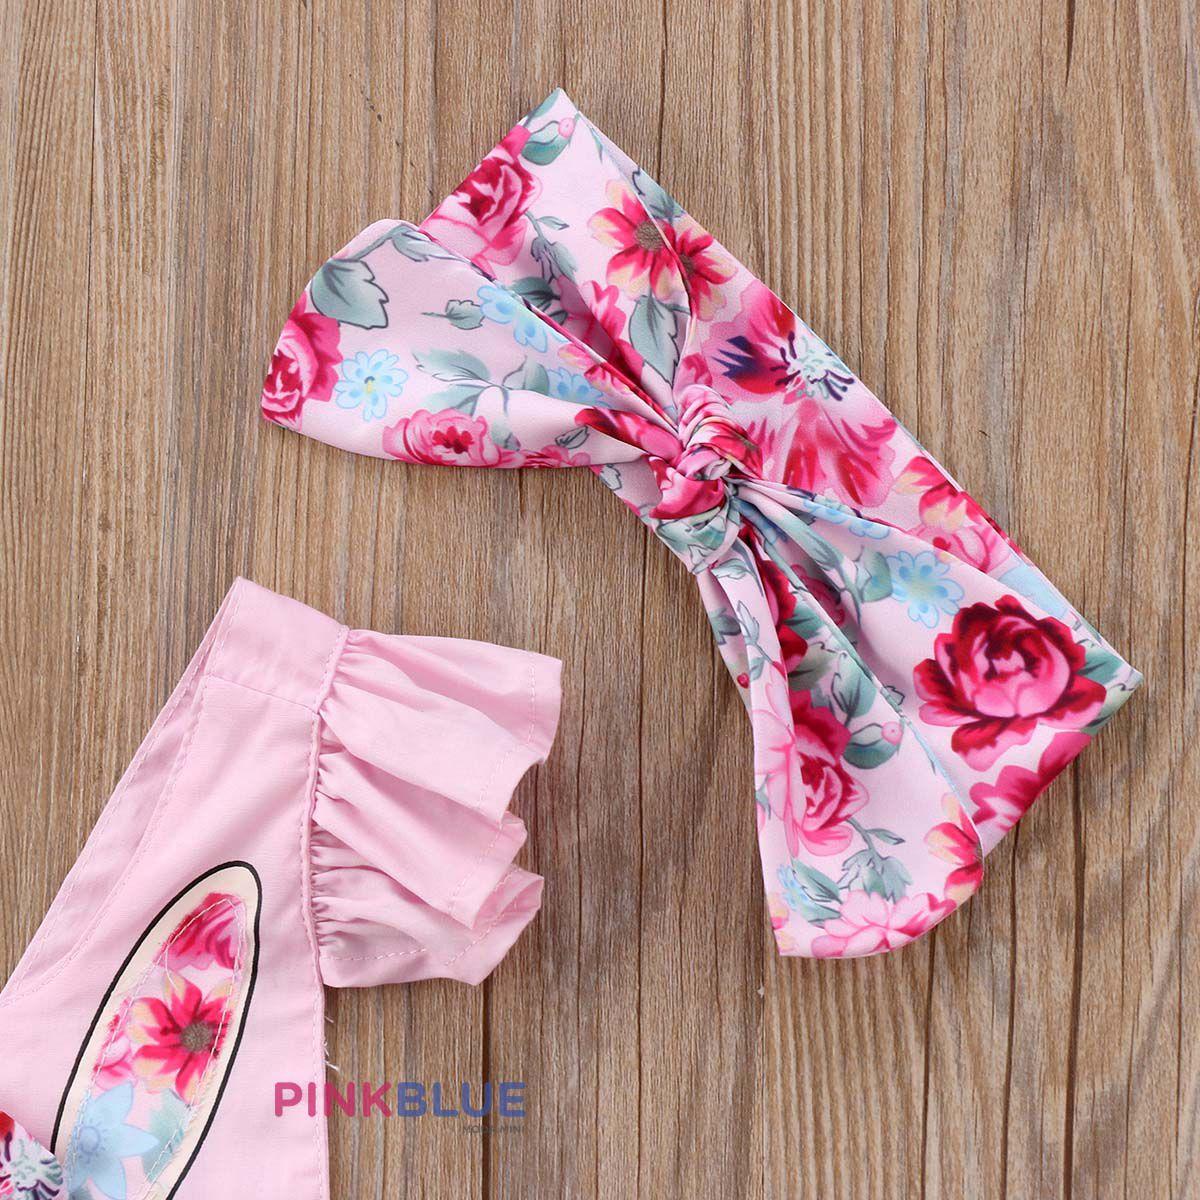 Romper coelhinho floral pink com faixa